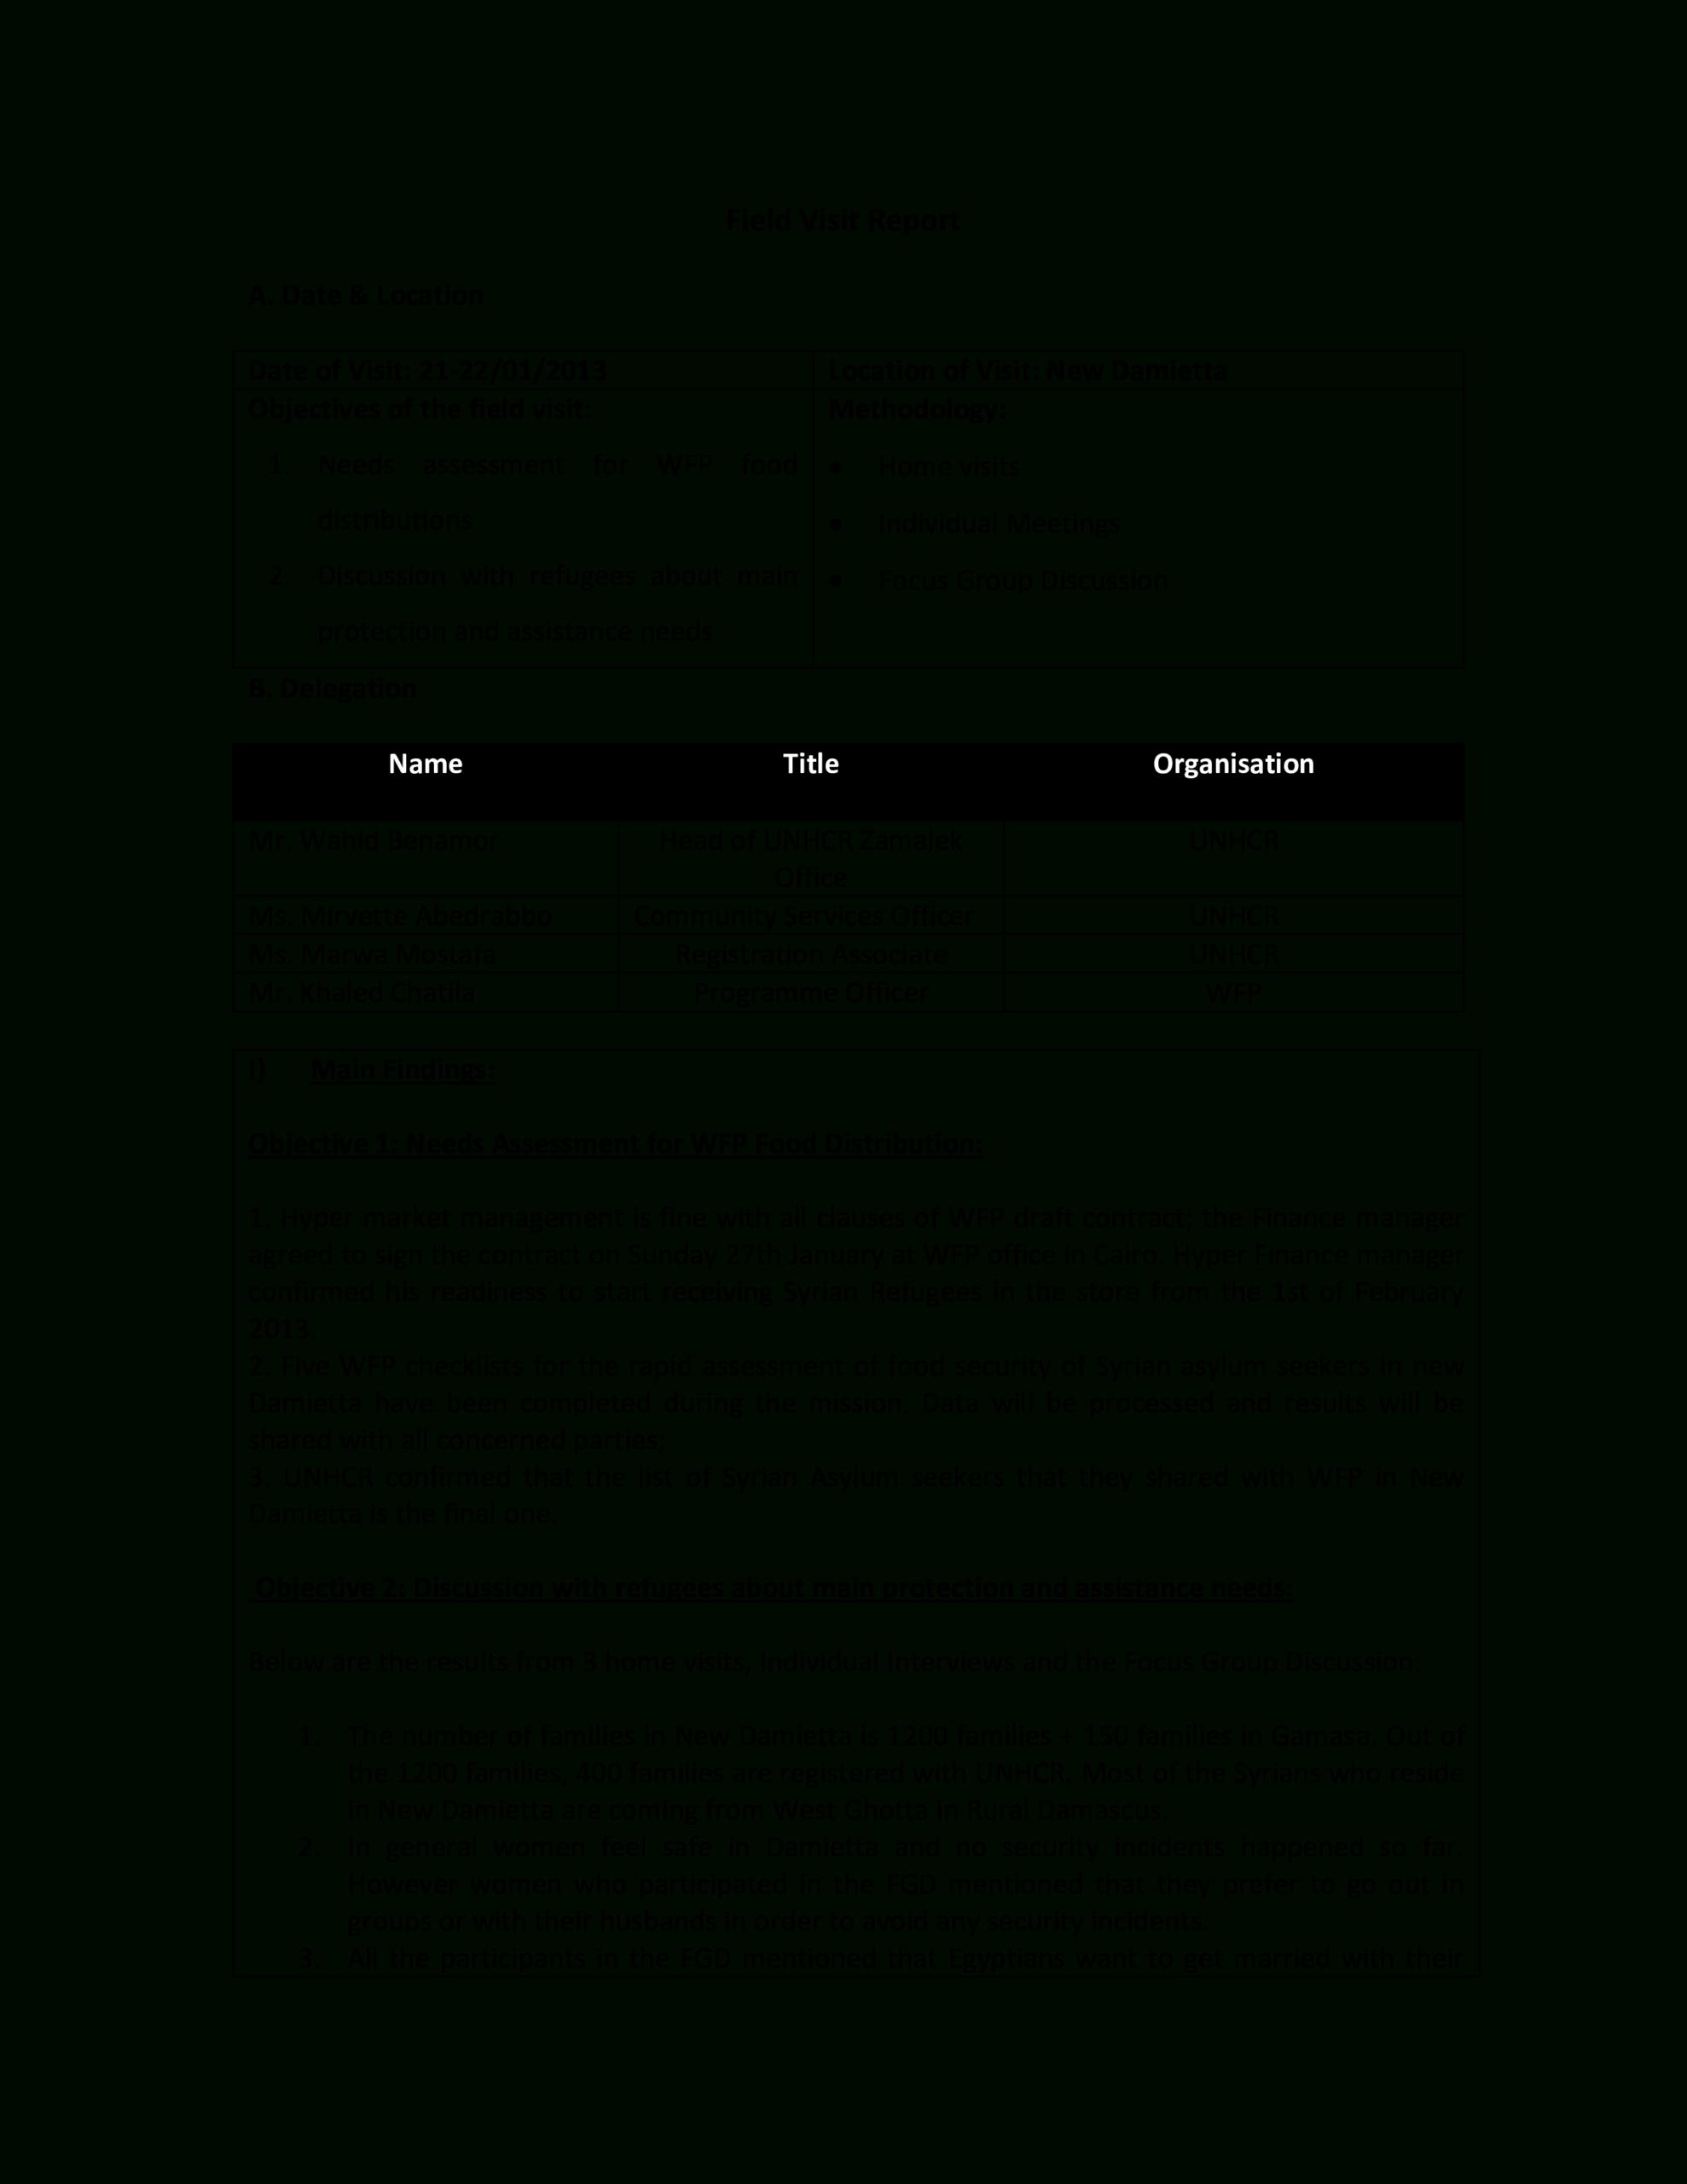 Télécharger Gratuit Field Visit Report Within Focus Group Discussion Report Template